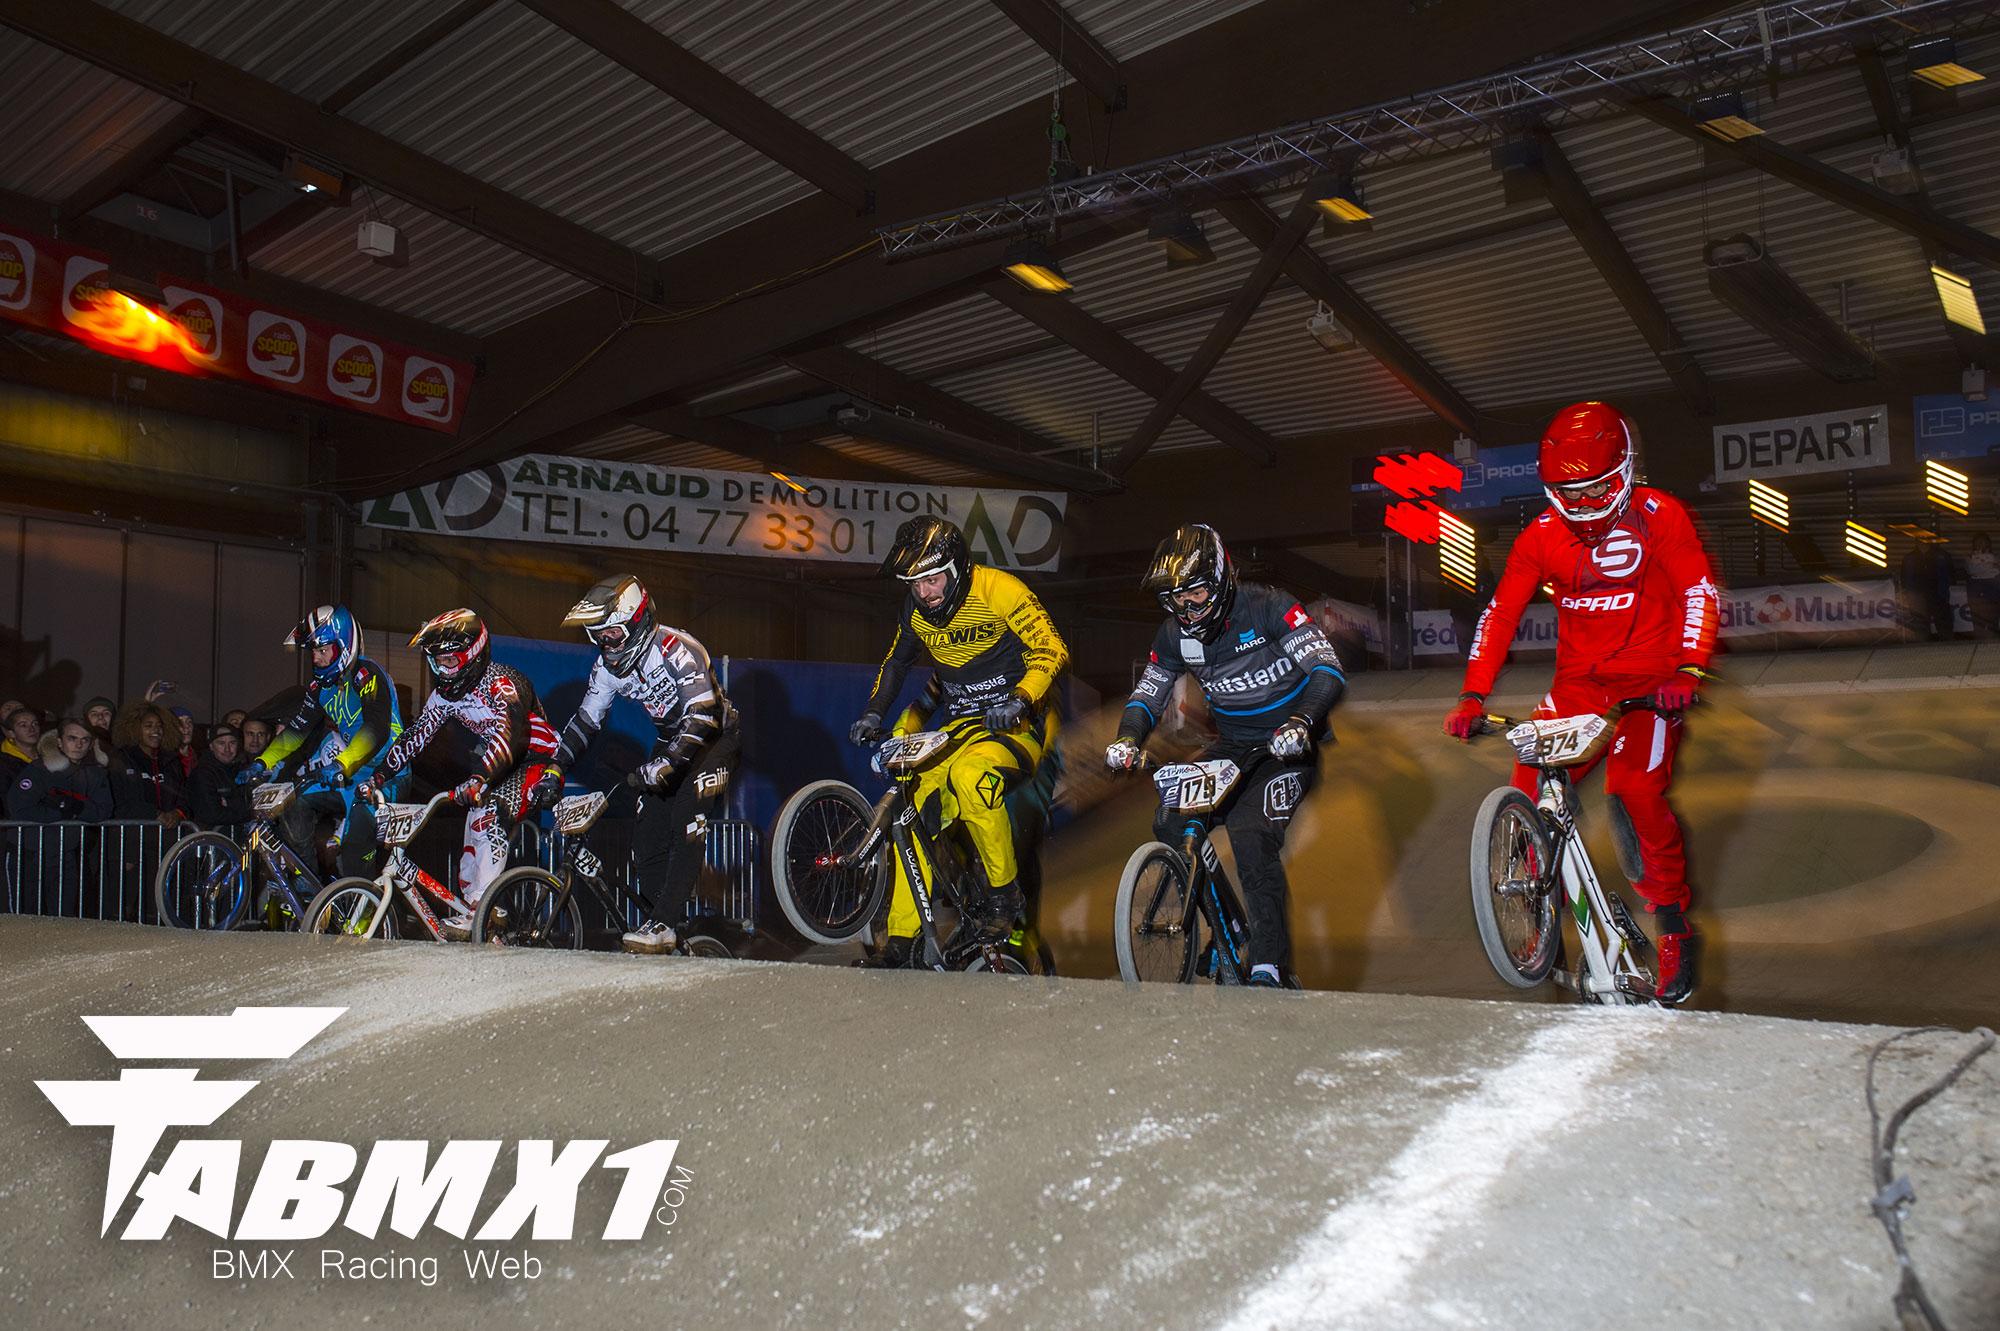 Indoor de St Etienne- Trophée des Nations